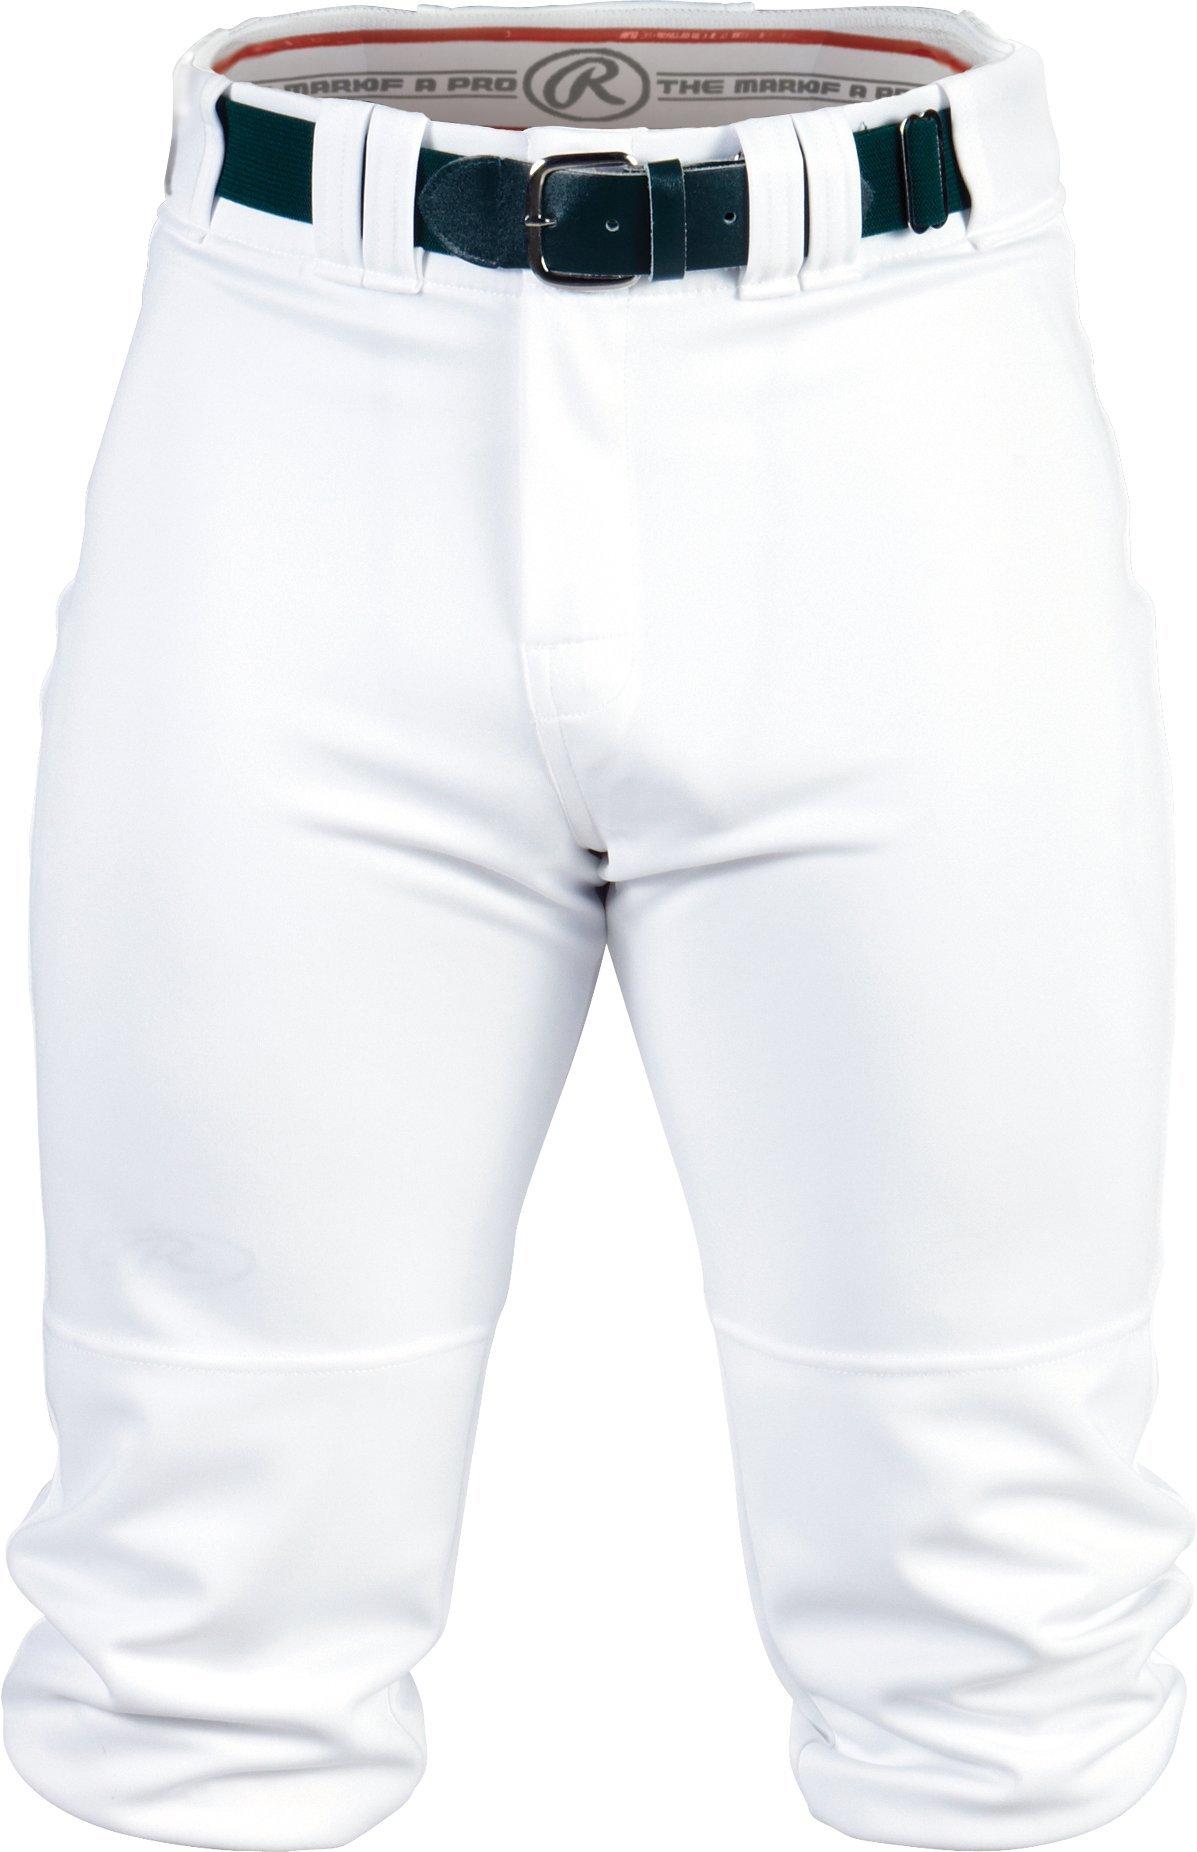 Rawlings Men's Knee-High Pants, Small, White by Rawlings